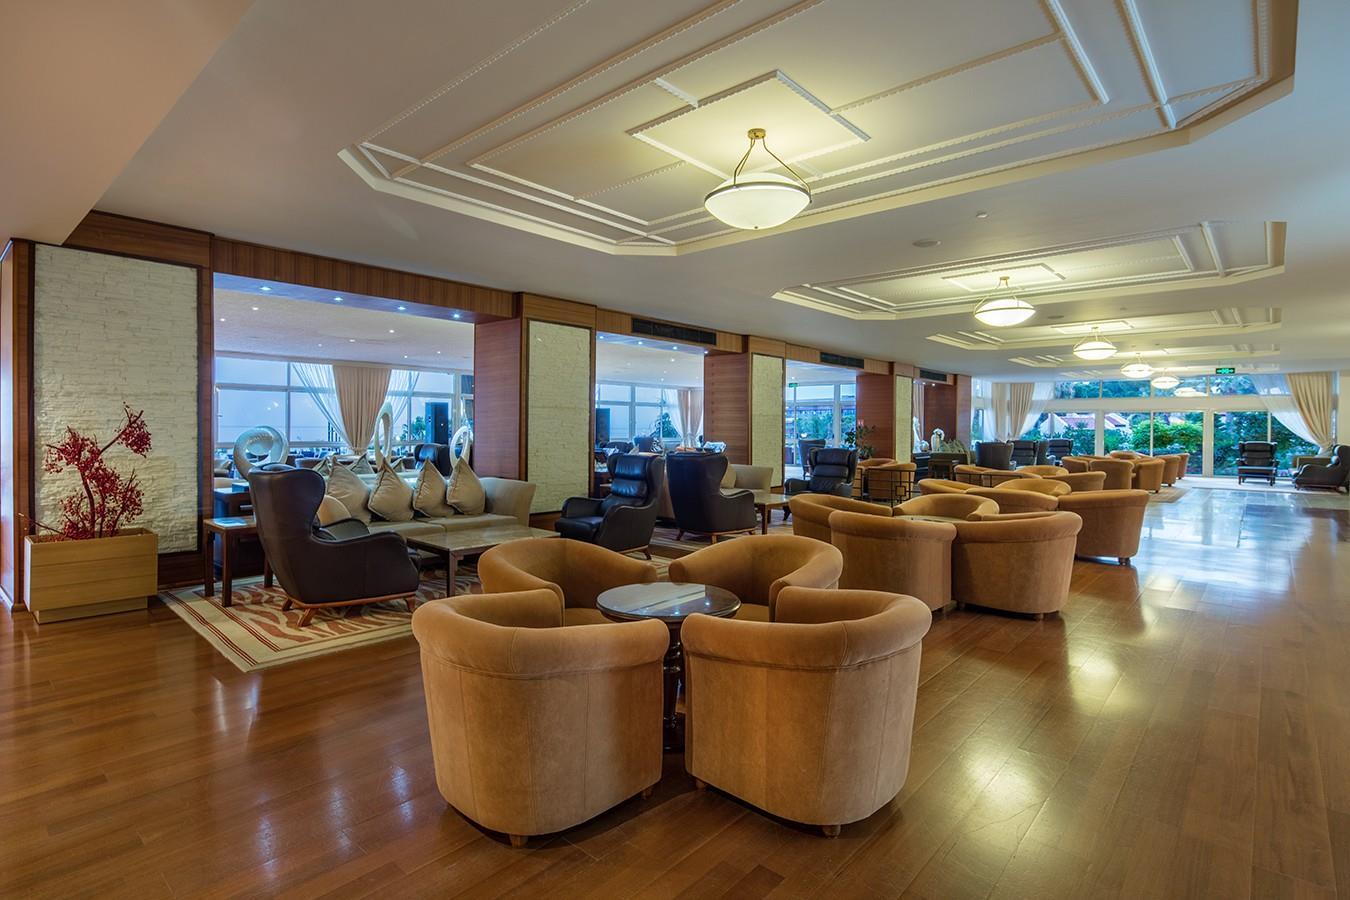 Acapulco Resort Convention Spa205102